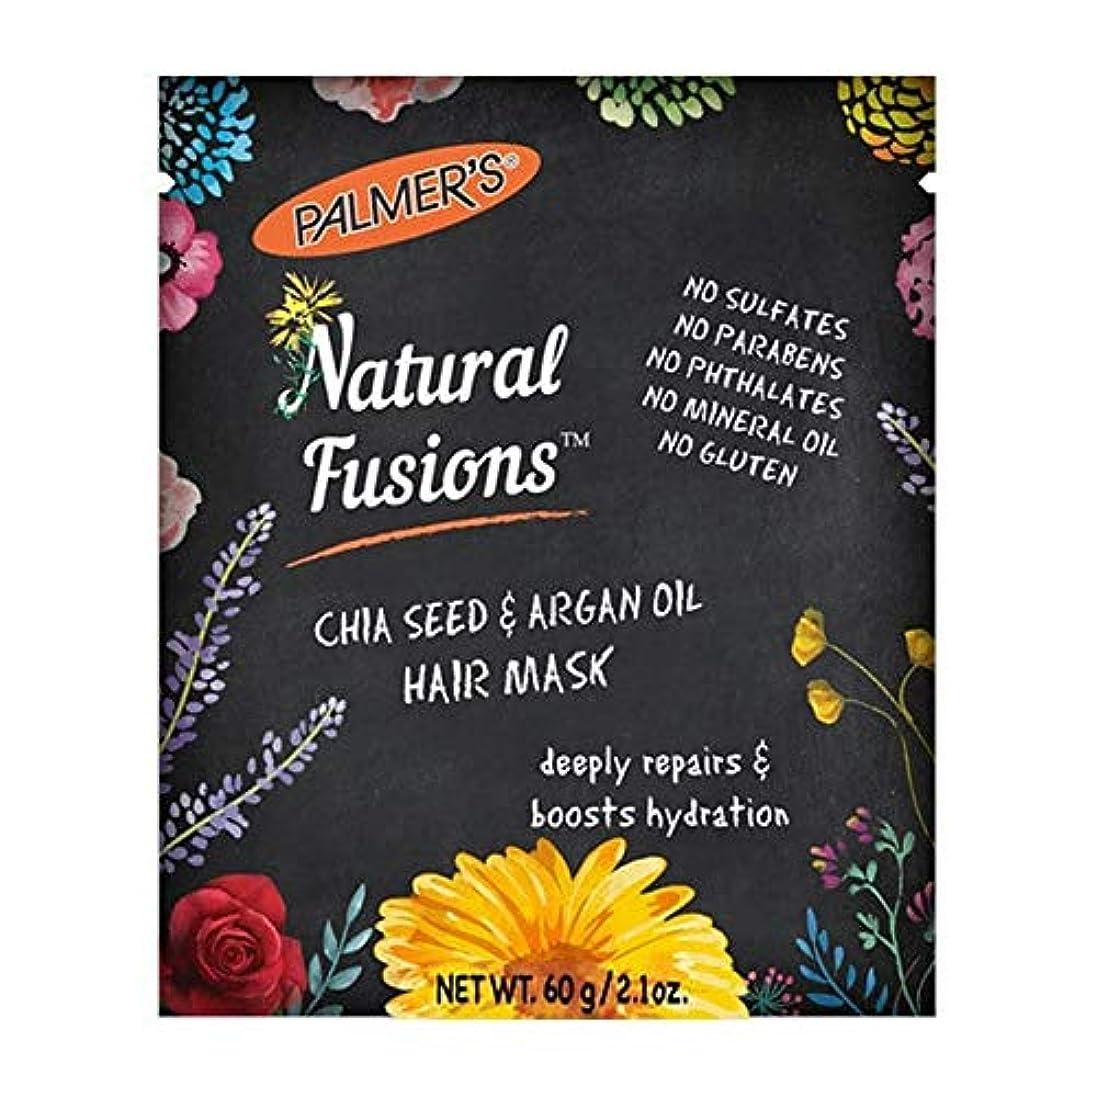 [Palmer's ] パーマーの自然な融合チアシード&アルガンオイルヘアマスク60グラム - Palmer's Natural Fusions Chia Seed & Argan Oil Hair Mask 60g [...